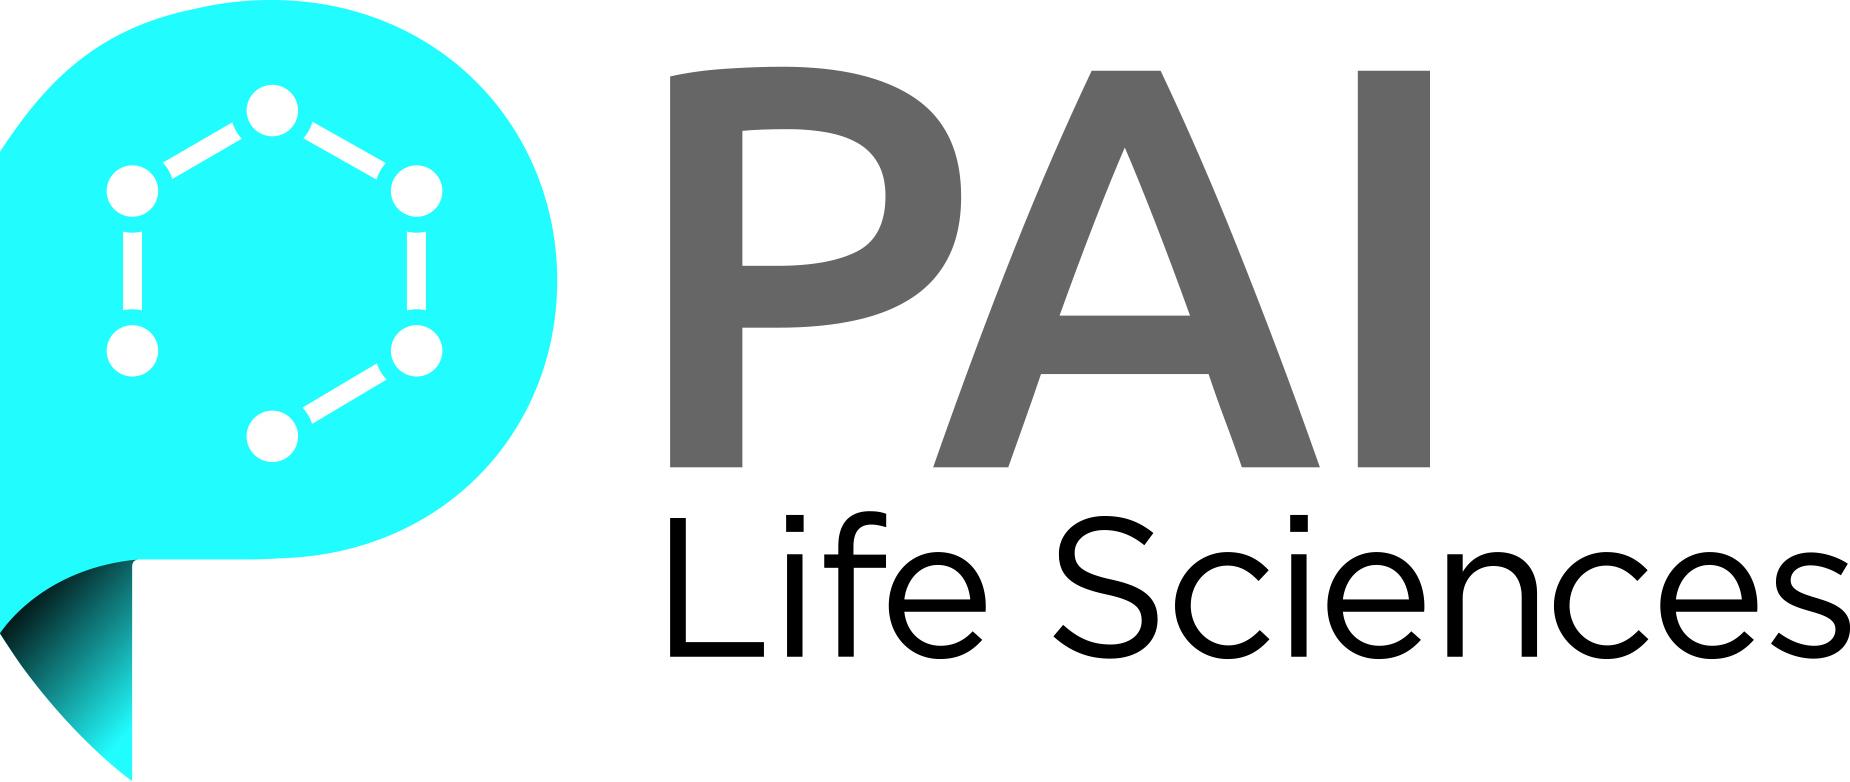 PAI life Sciences logo